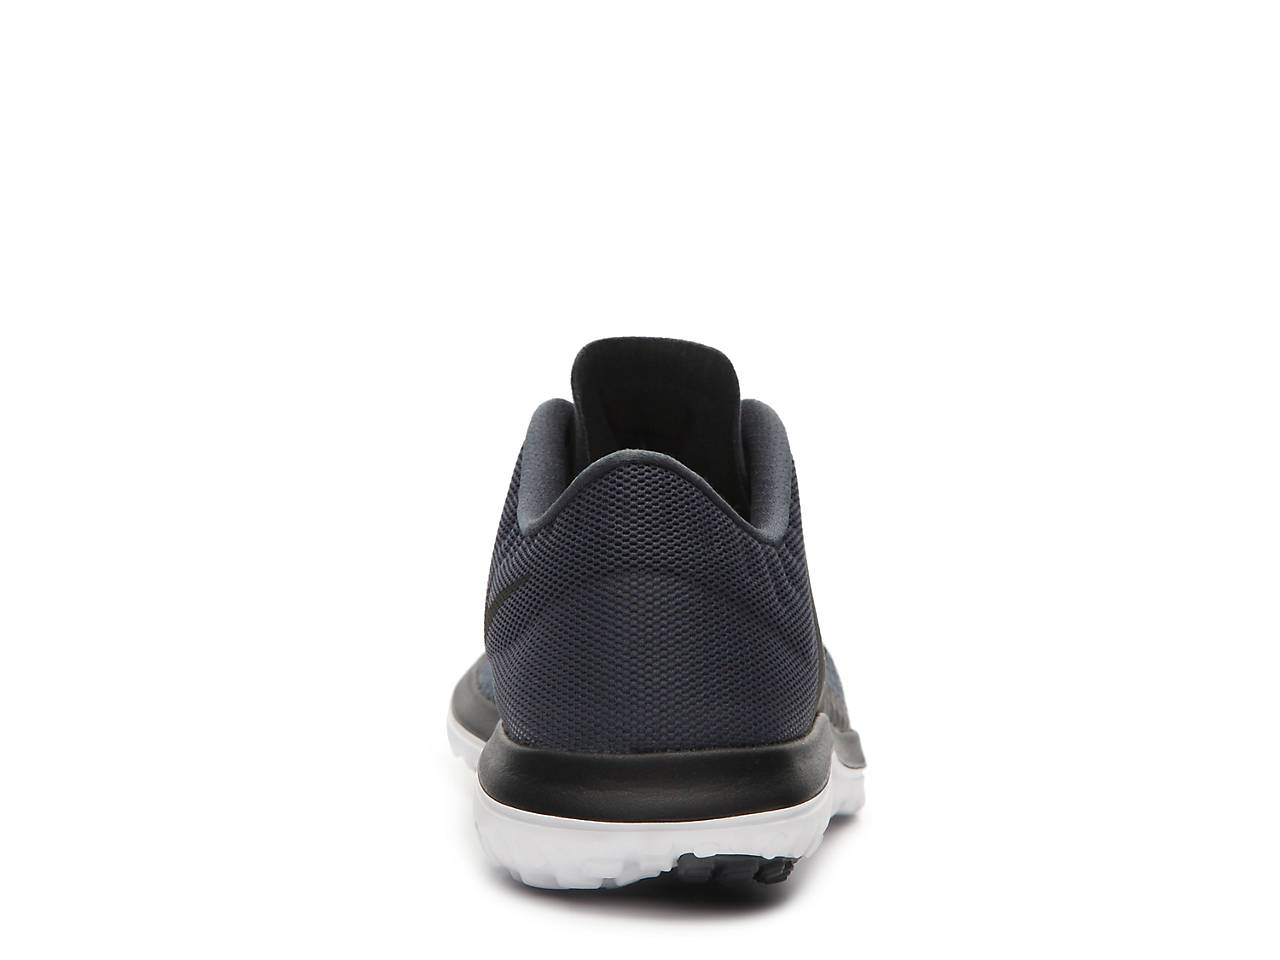 312b52b653a Nike FS Lite Run 2 Lightweight Running Shoe - Men s Men s Shoes